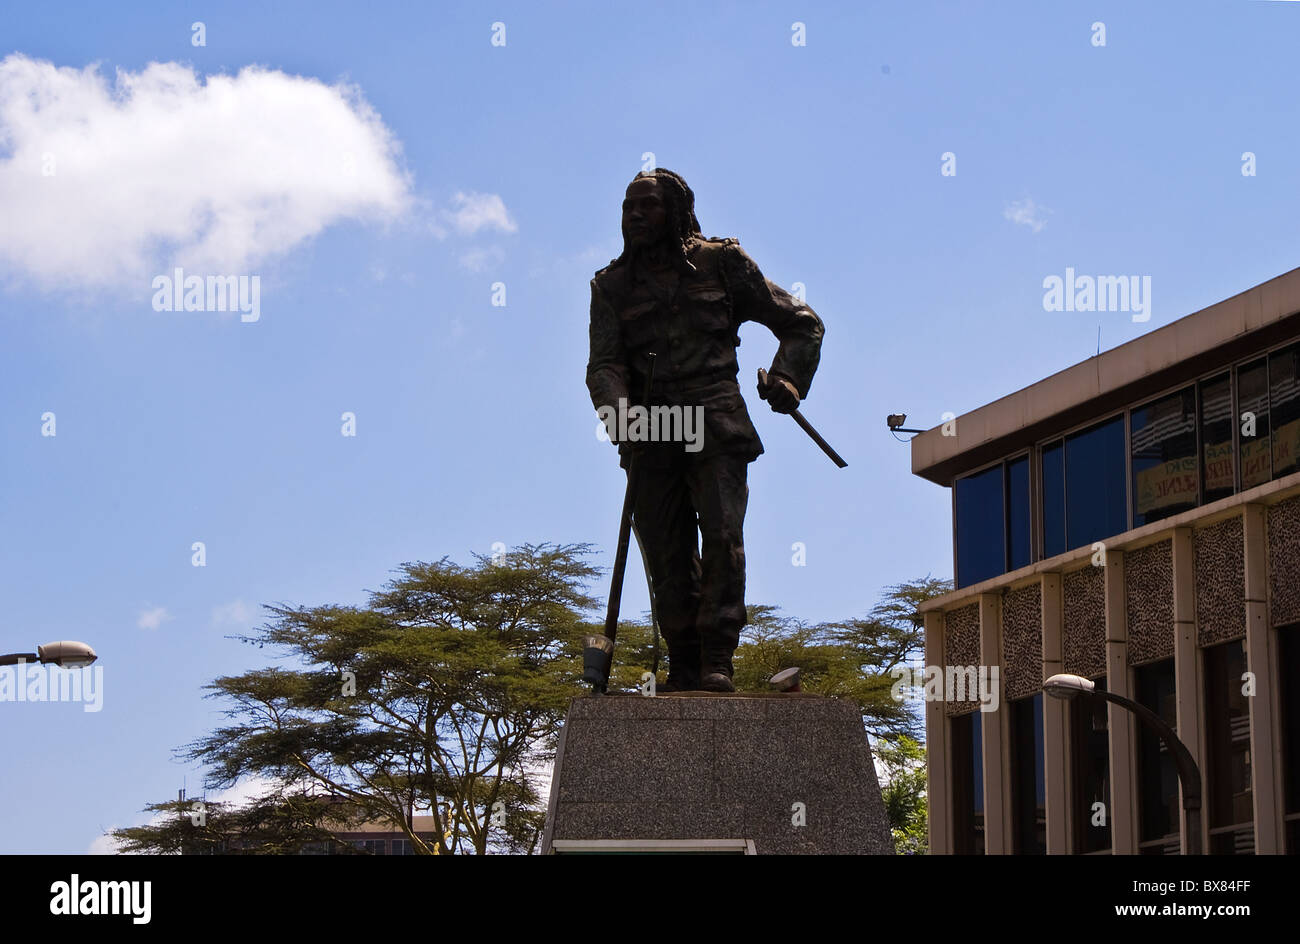 Statue of Dedan Kimathi - Stock Image